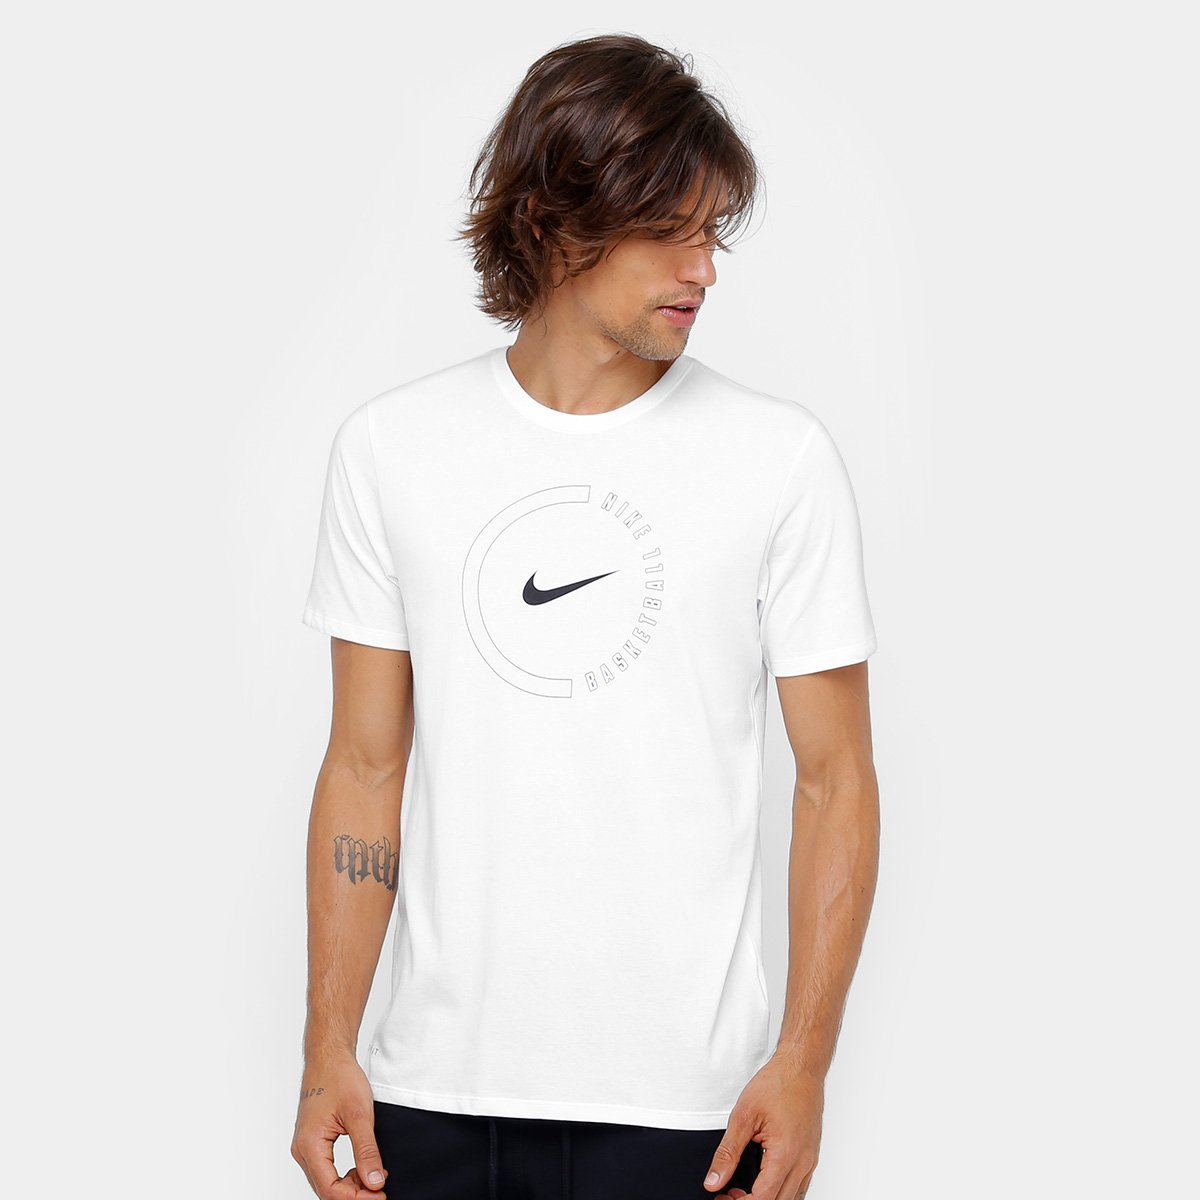 622cc0f47f Camiseta Nike Funda Circle Masculina